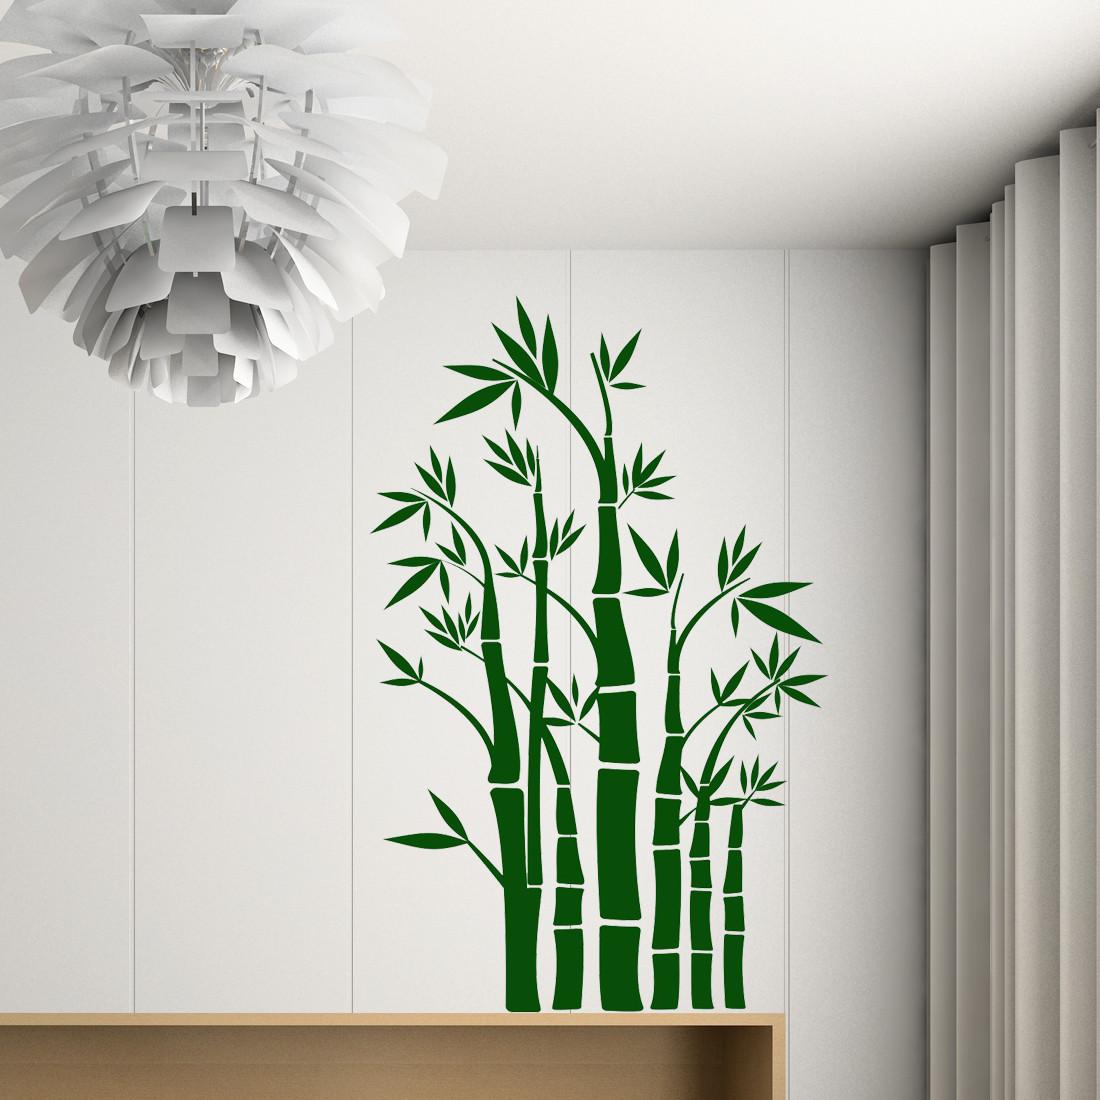 Chipakk Mini Bamboos Green Wall Decal Small Pigmented